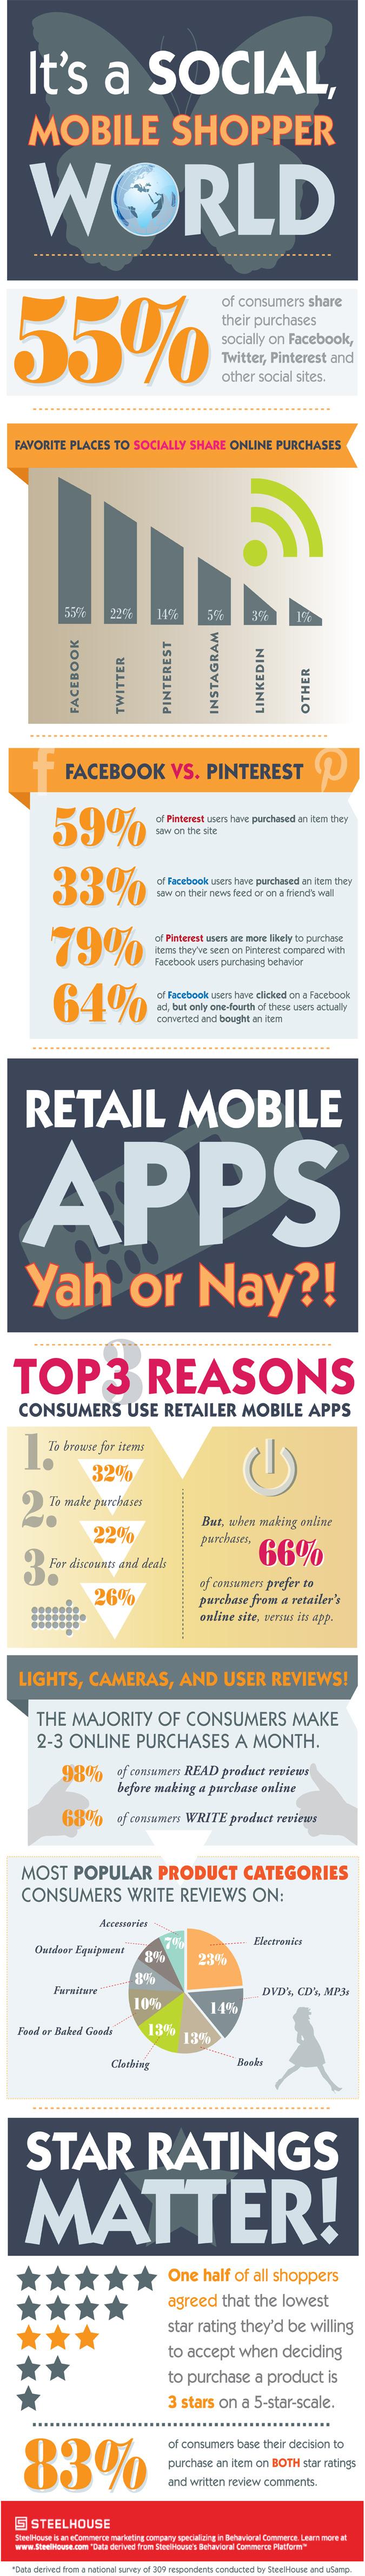 It's-A-Social-Mobile-Shopper-World-infographic